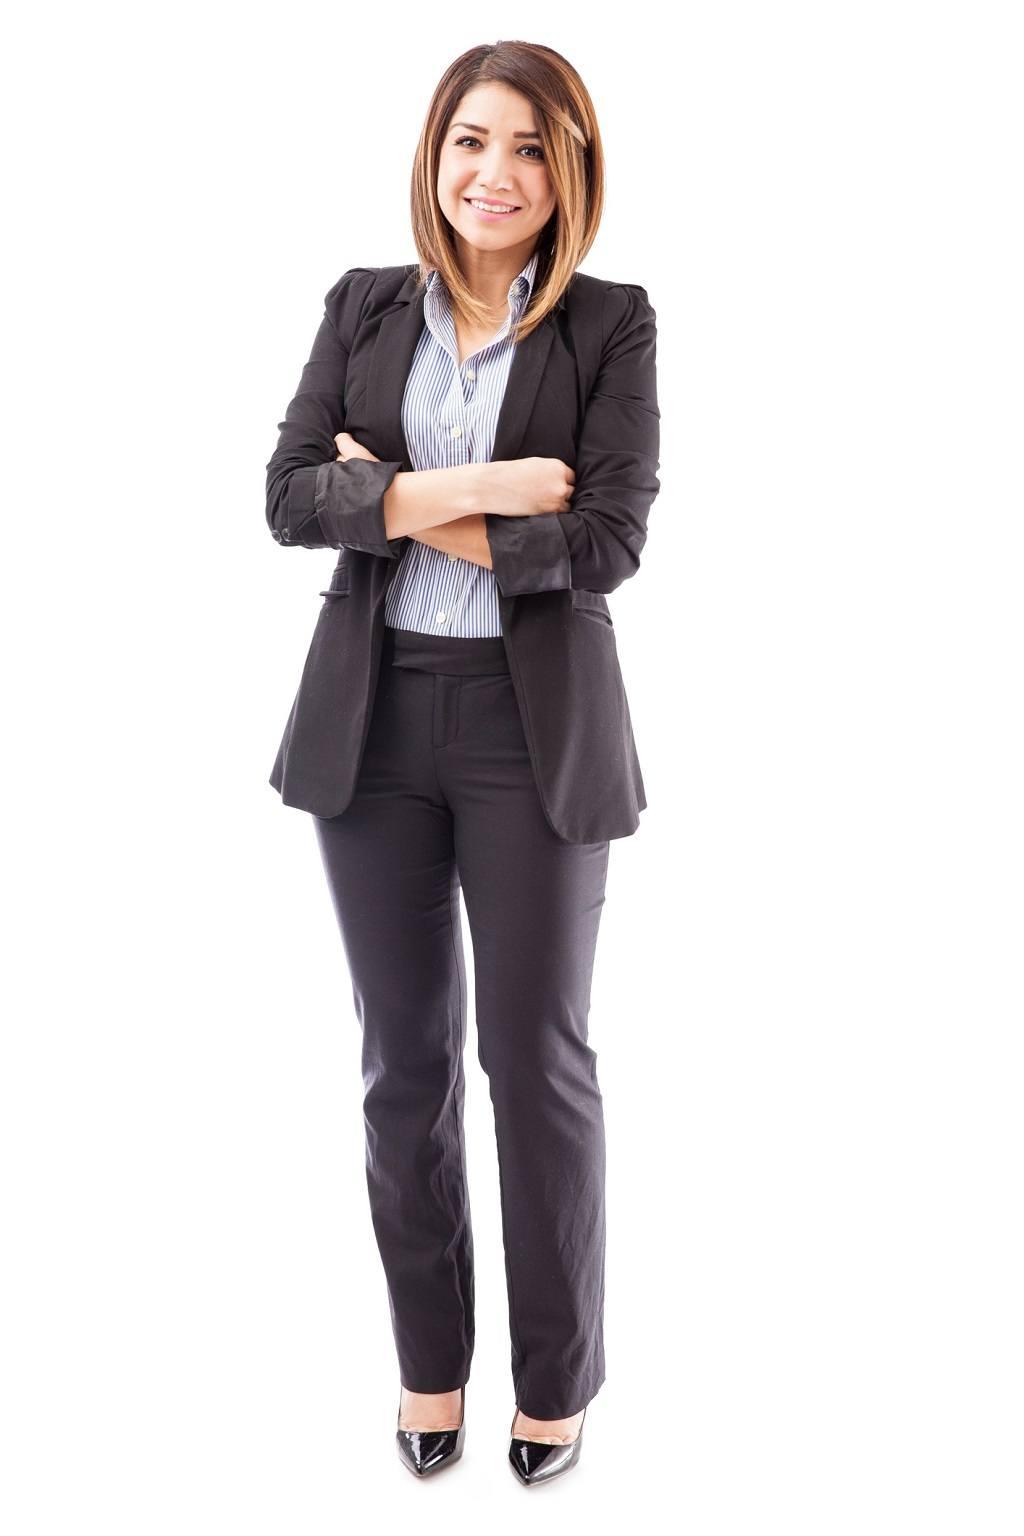 Hispanic salesperson wearing a suit